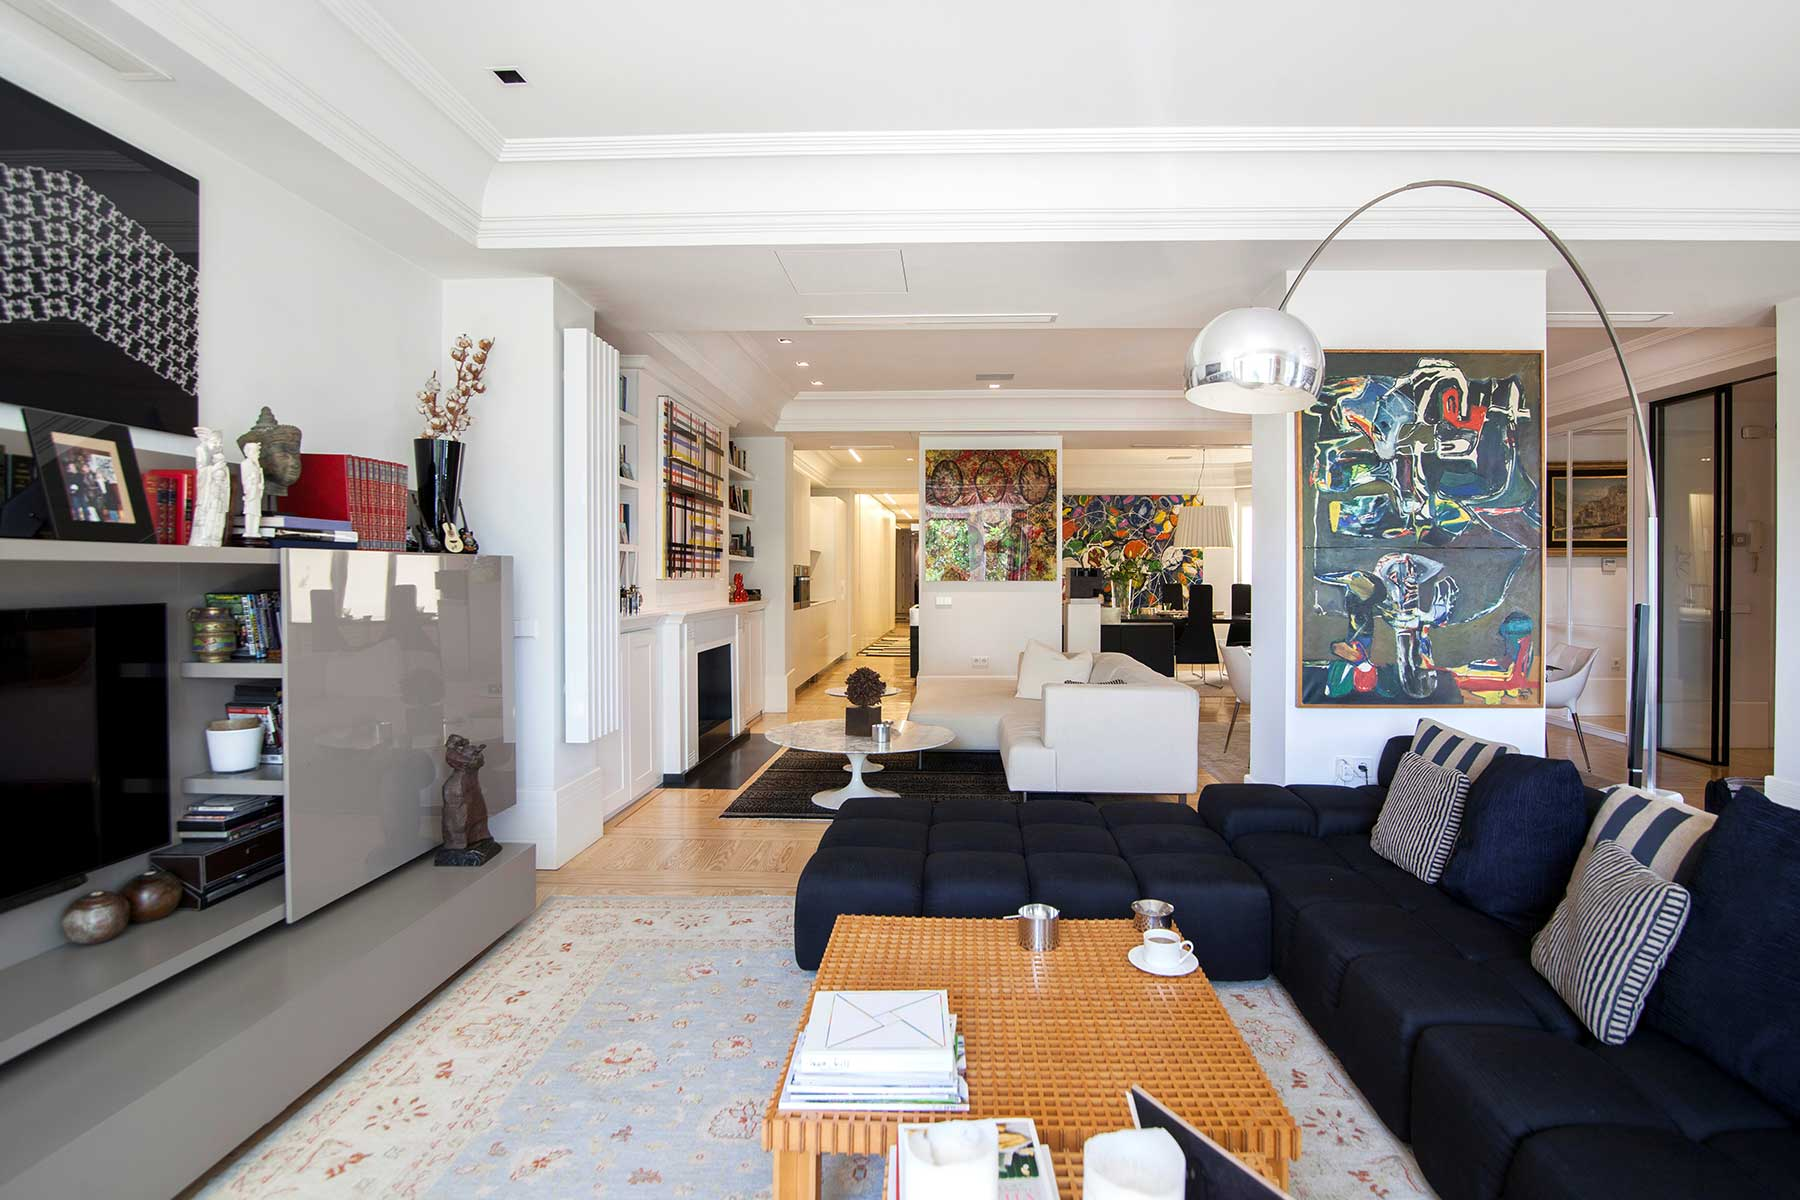 Madrid - Spain - Apartment, 4 rooms - Slideshow Picture 1